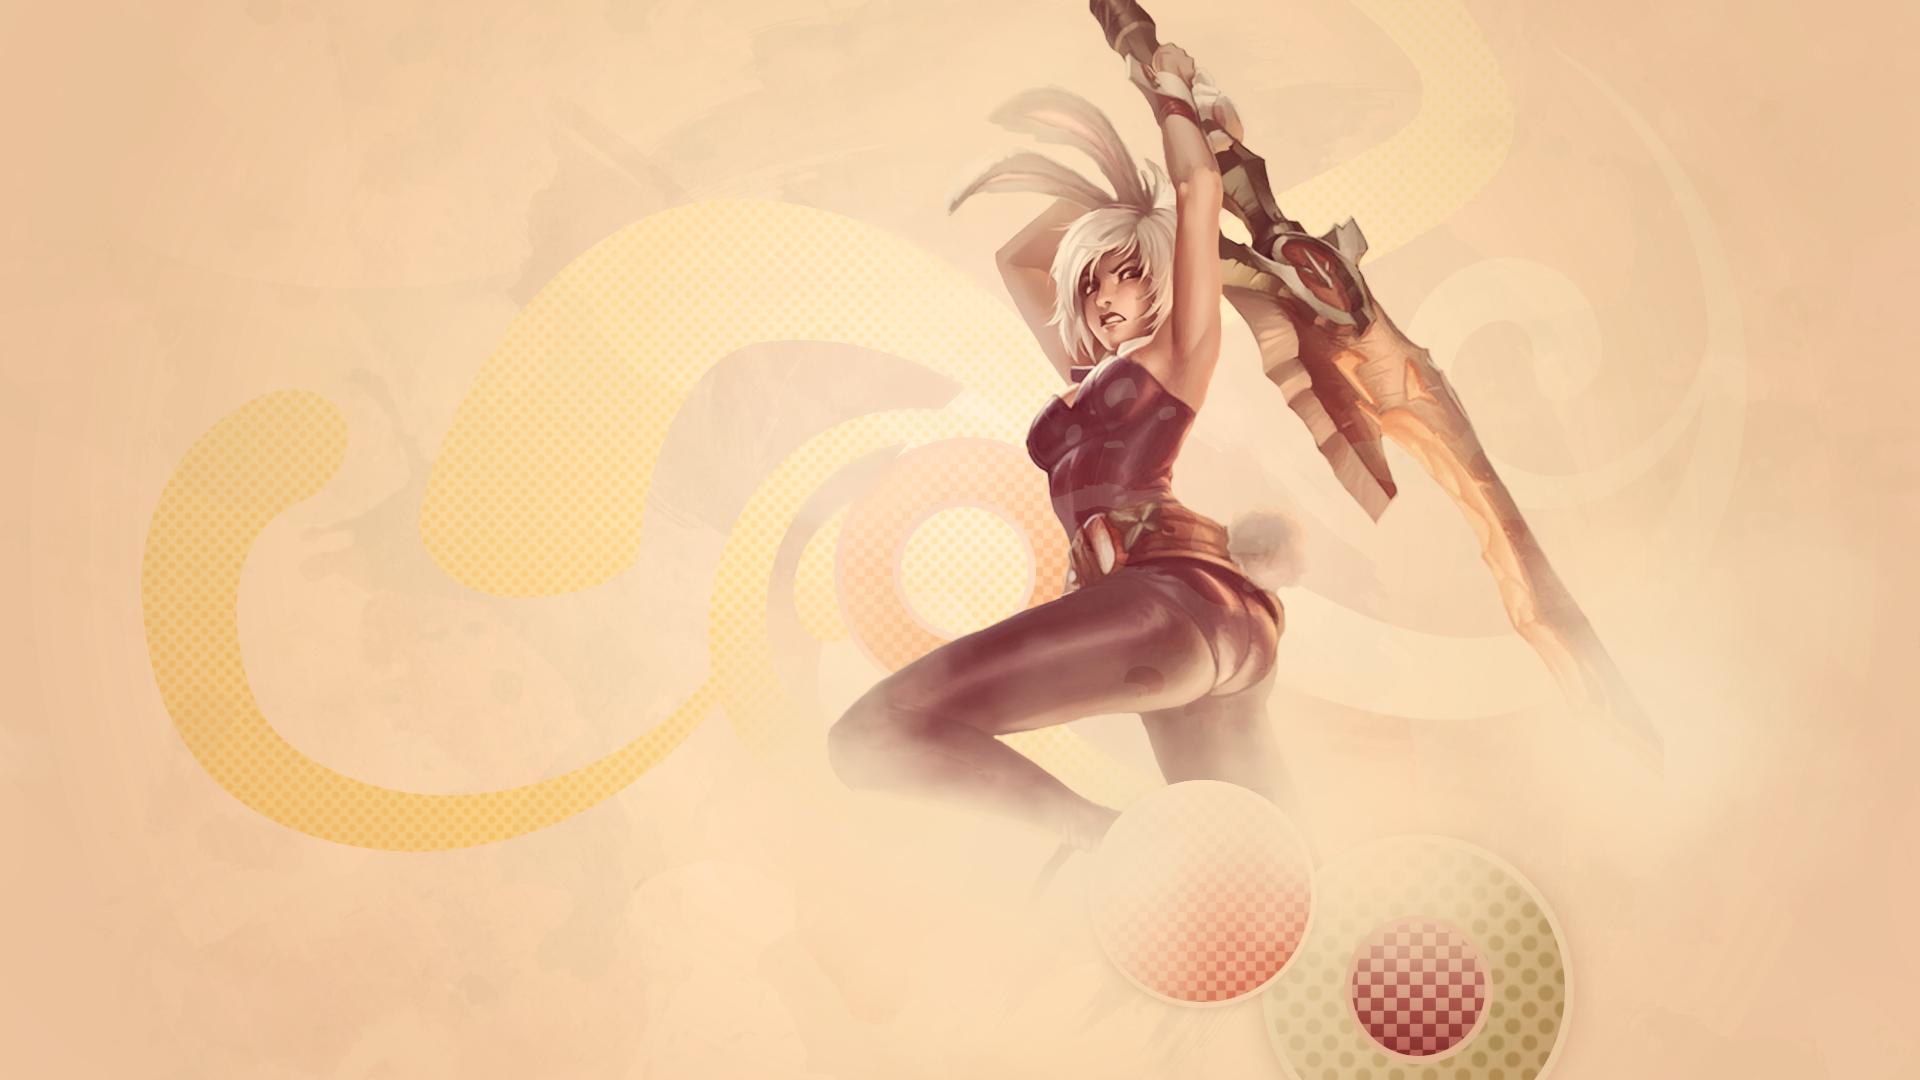 Battle Bunny Riven Wallpaper By Uberkayt On Deviantart